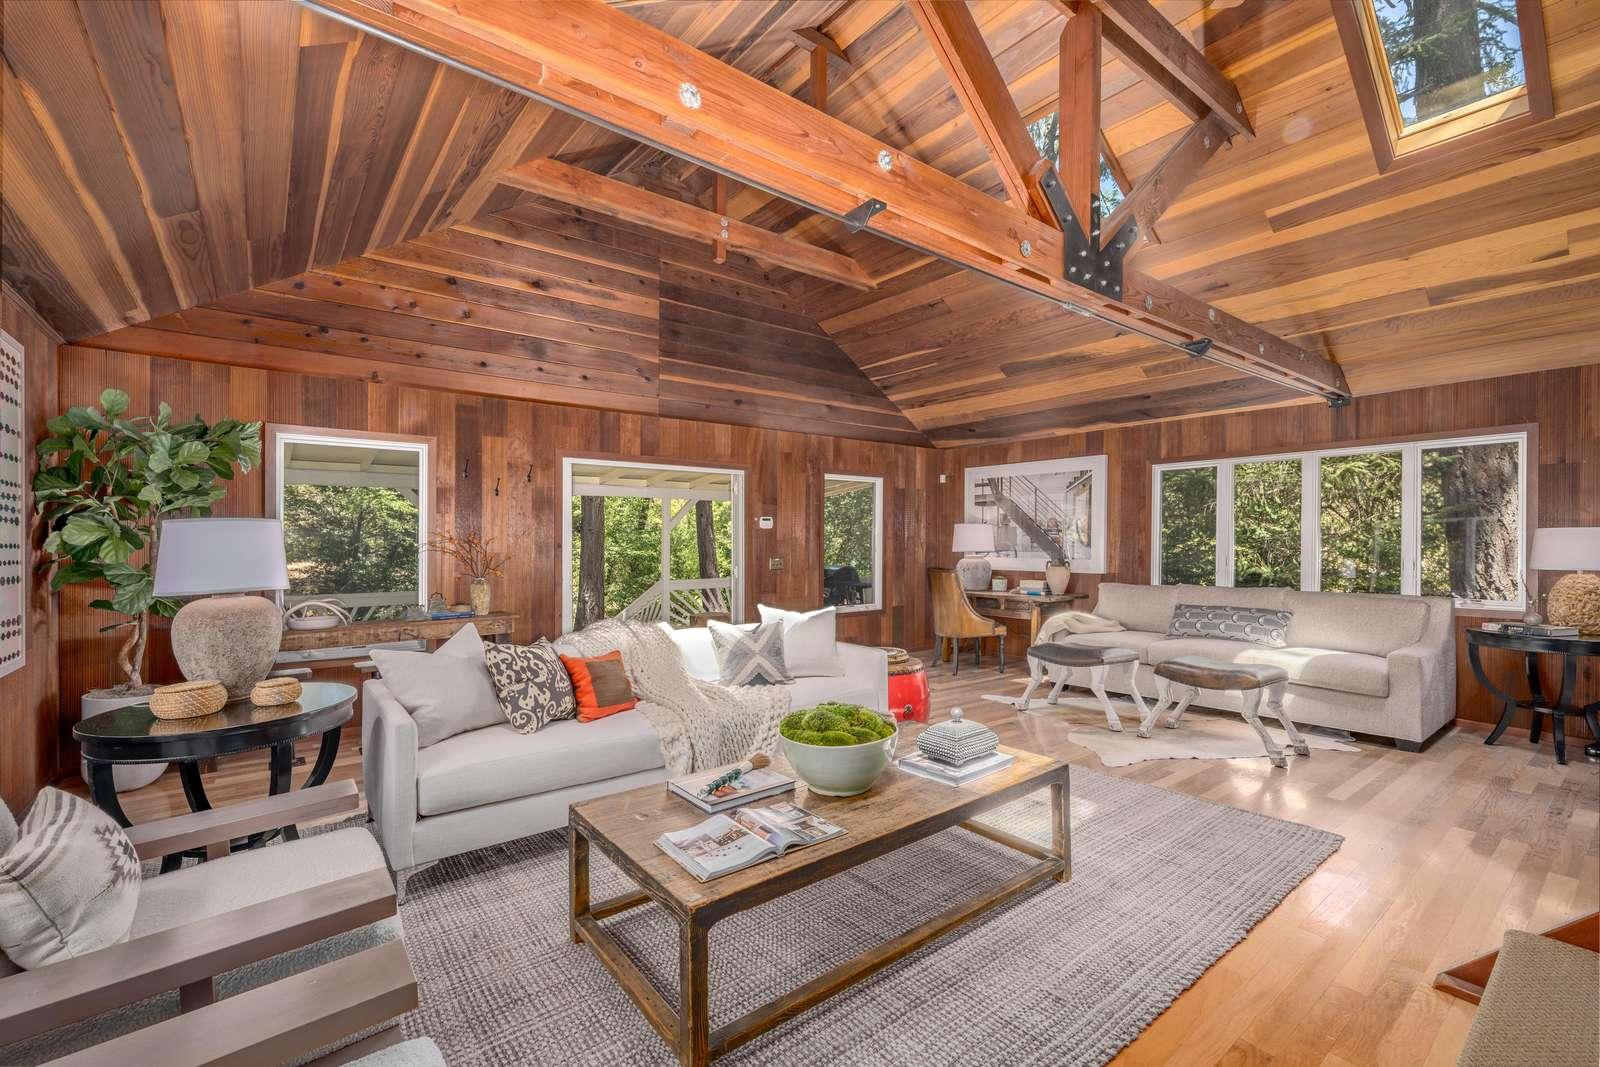 LUX Calistoga Mountain Cottage - property